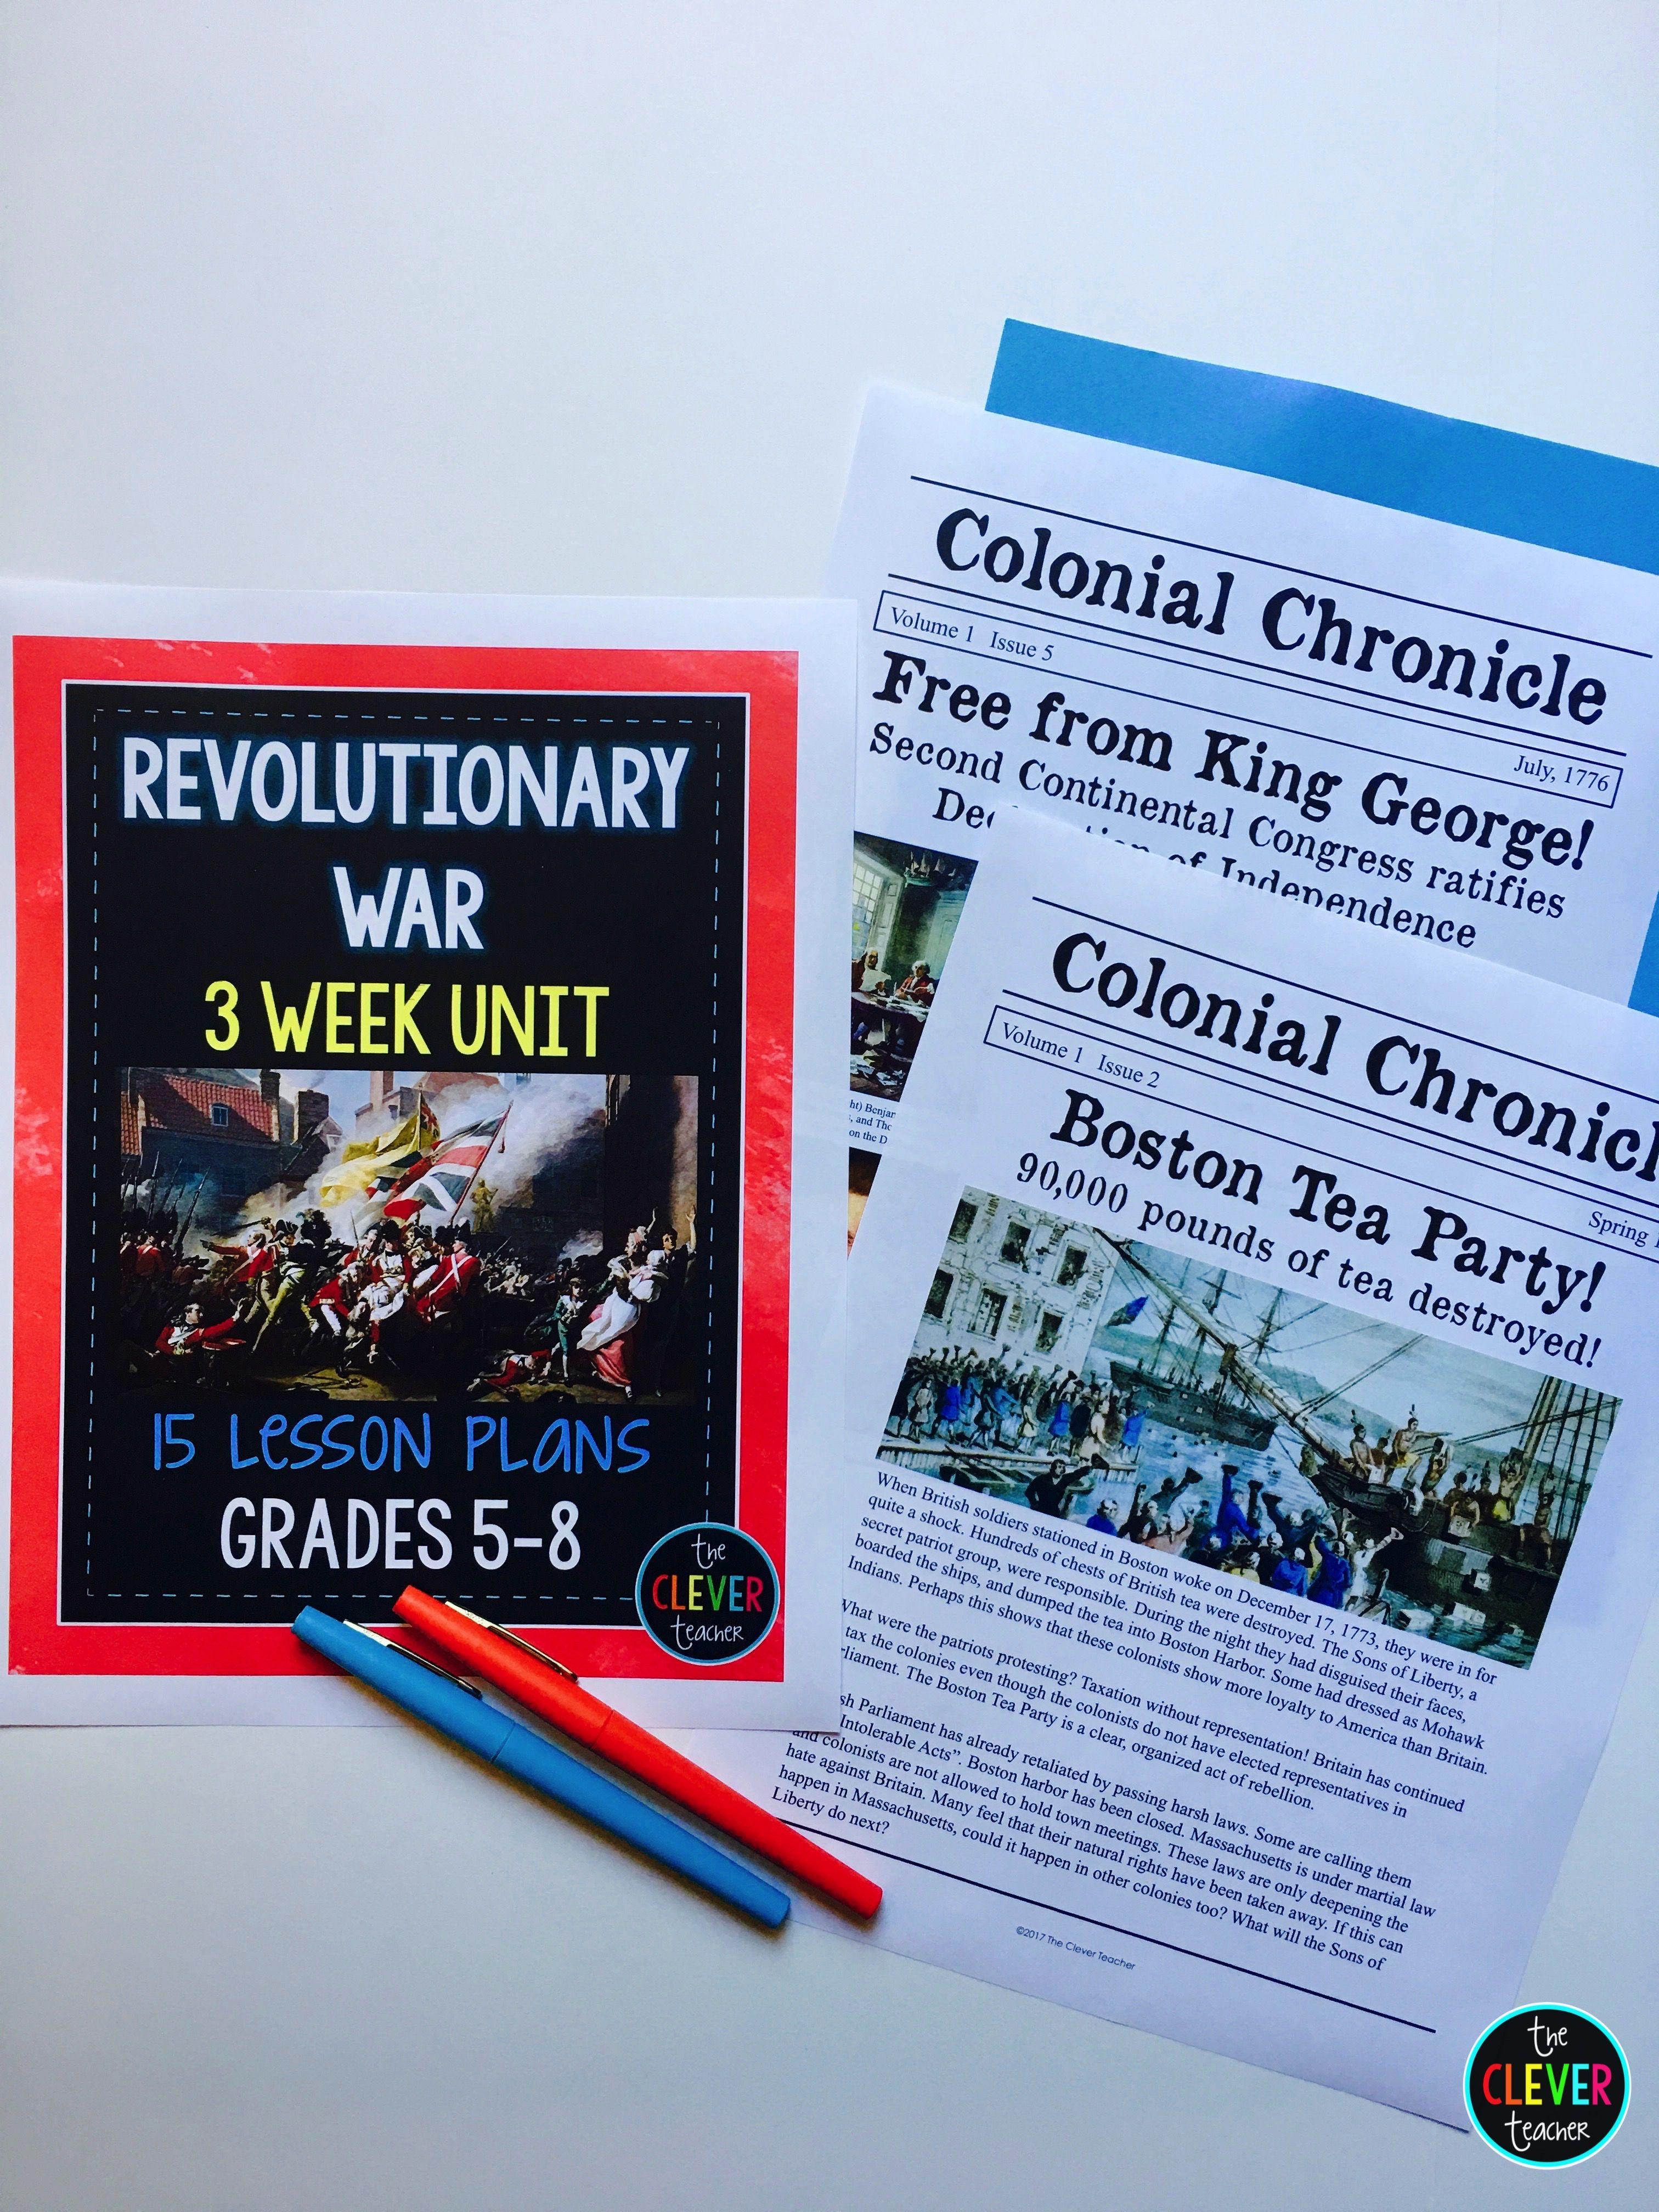 Revolutionary War 3 Week Unit